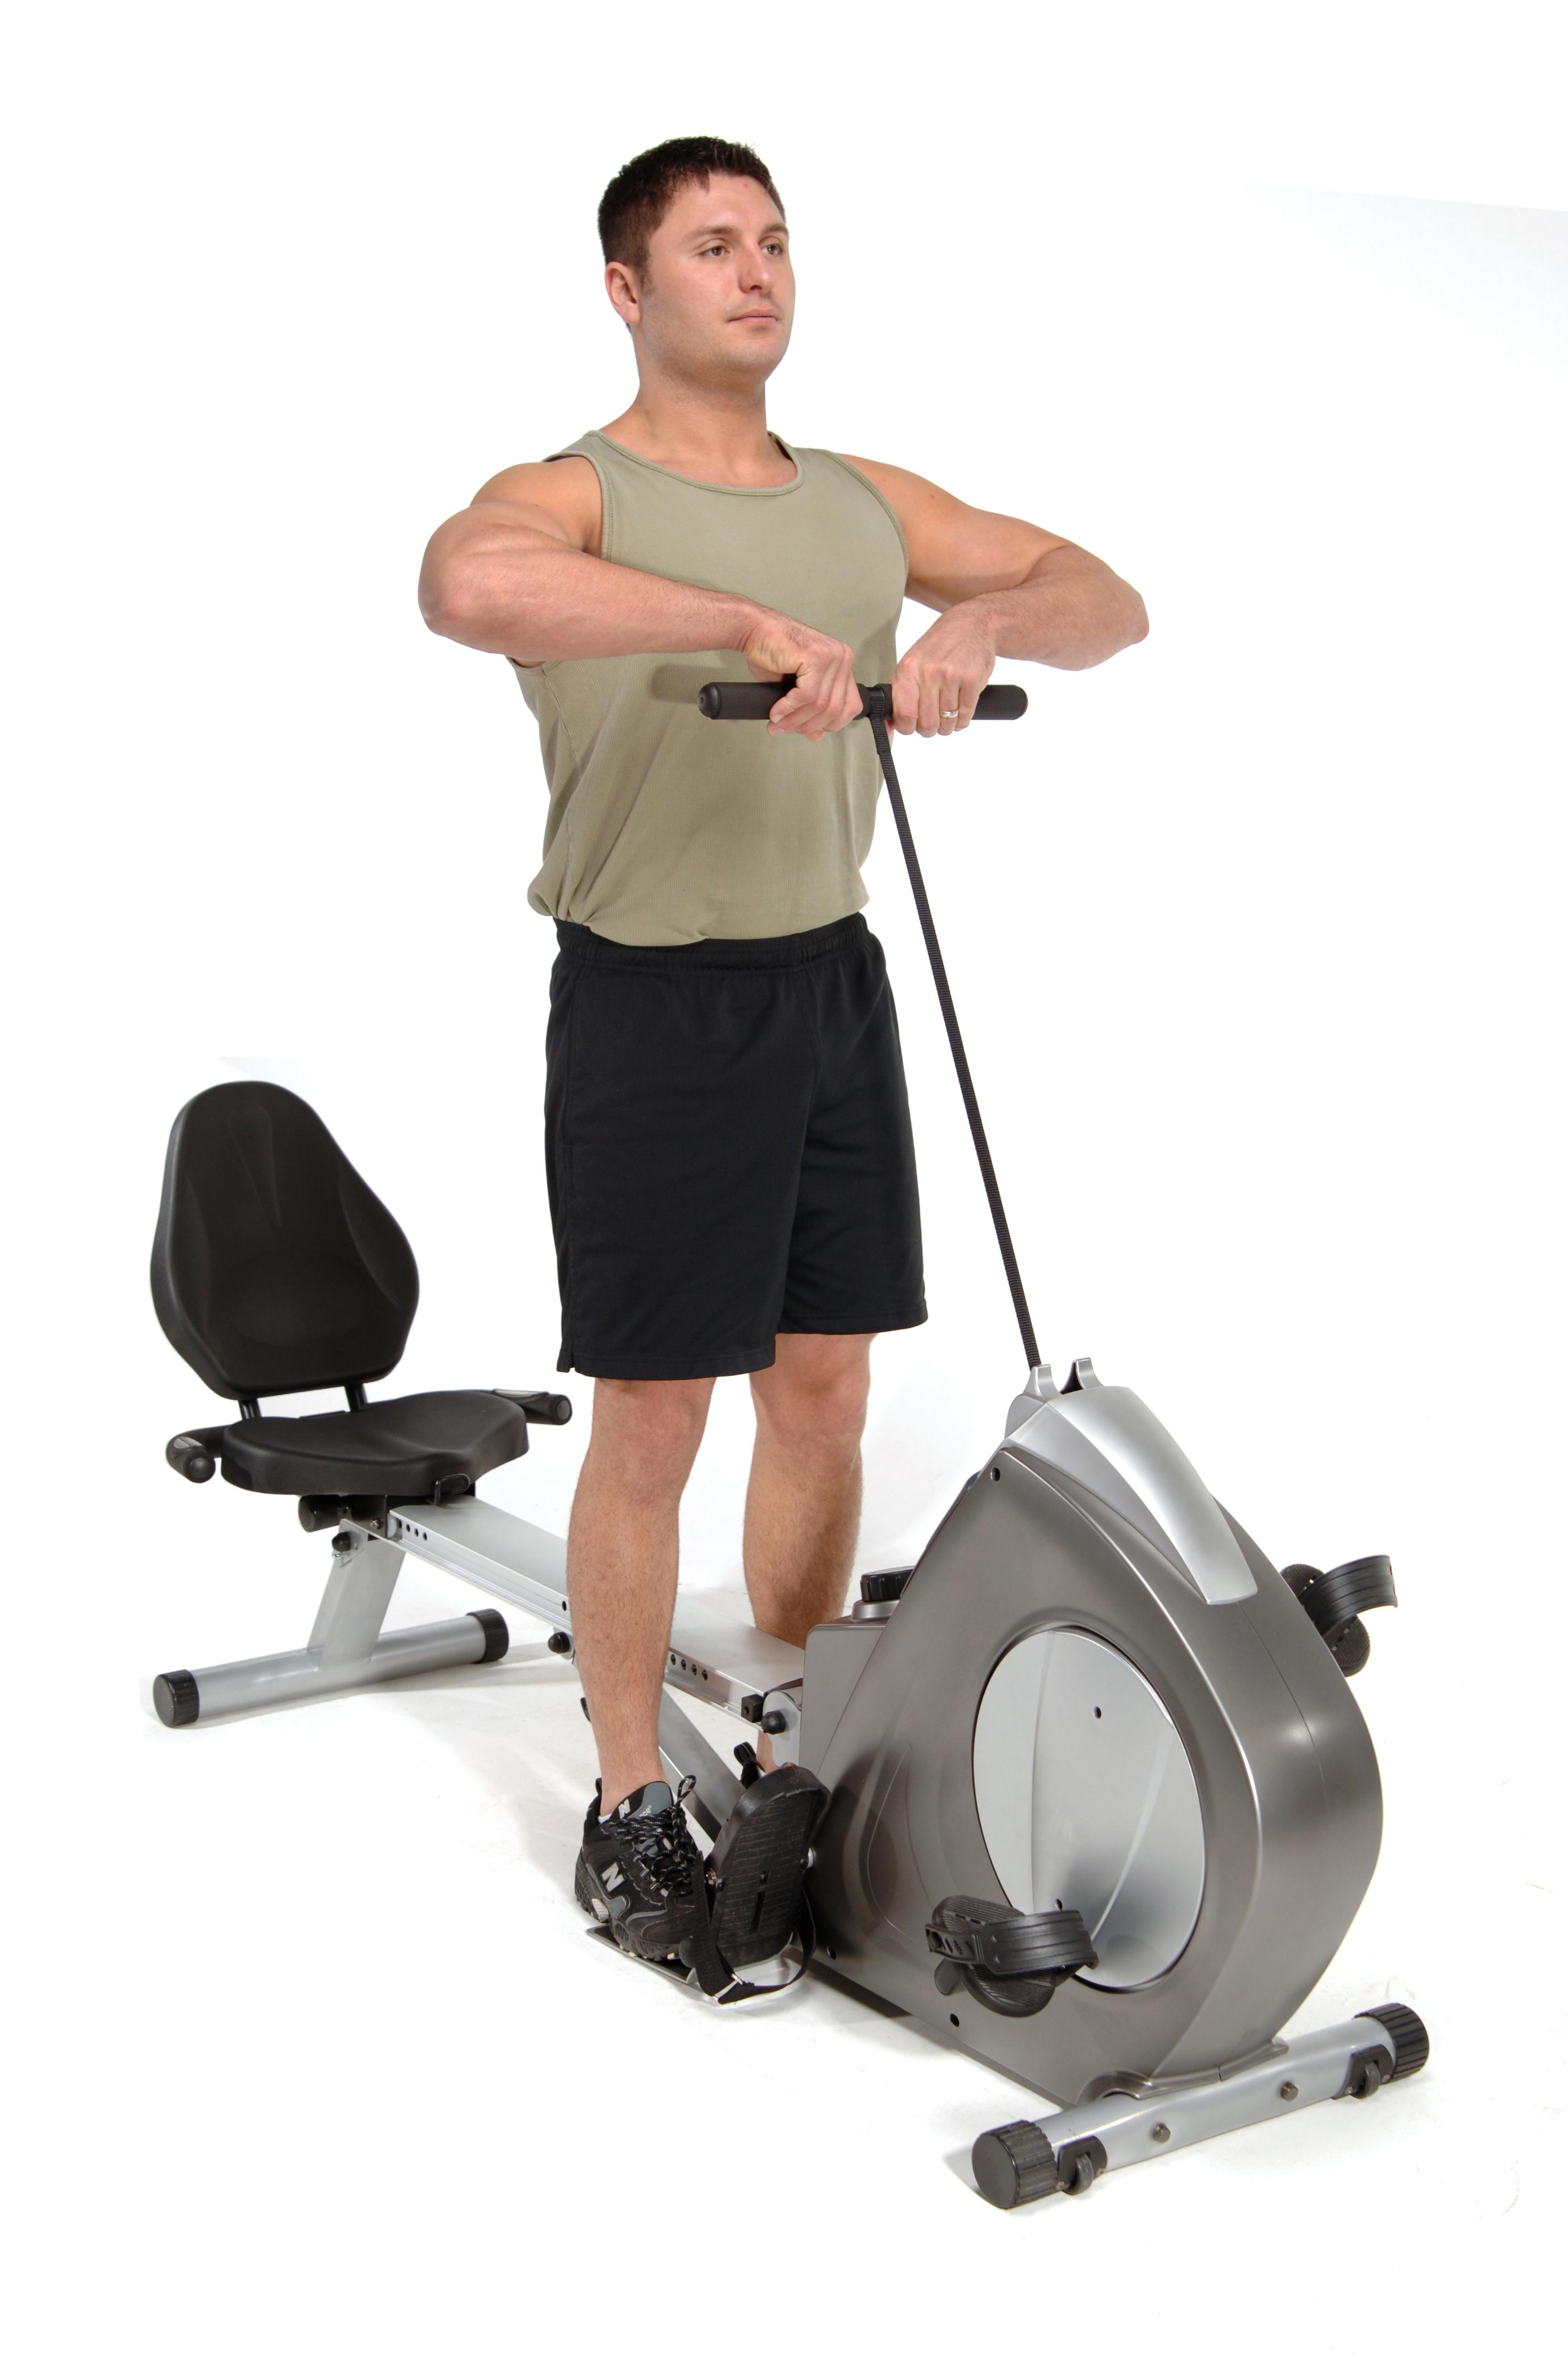 bike exercise machine benefits